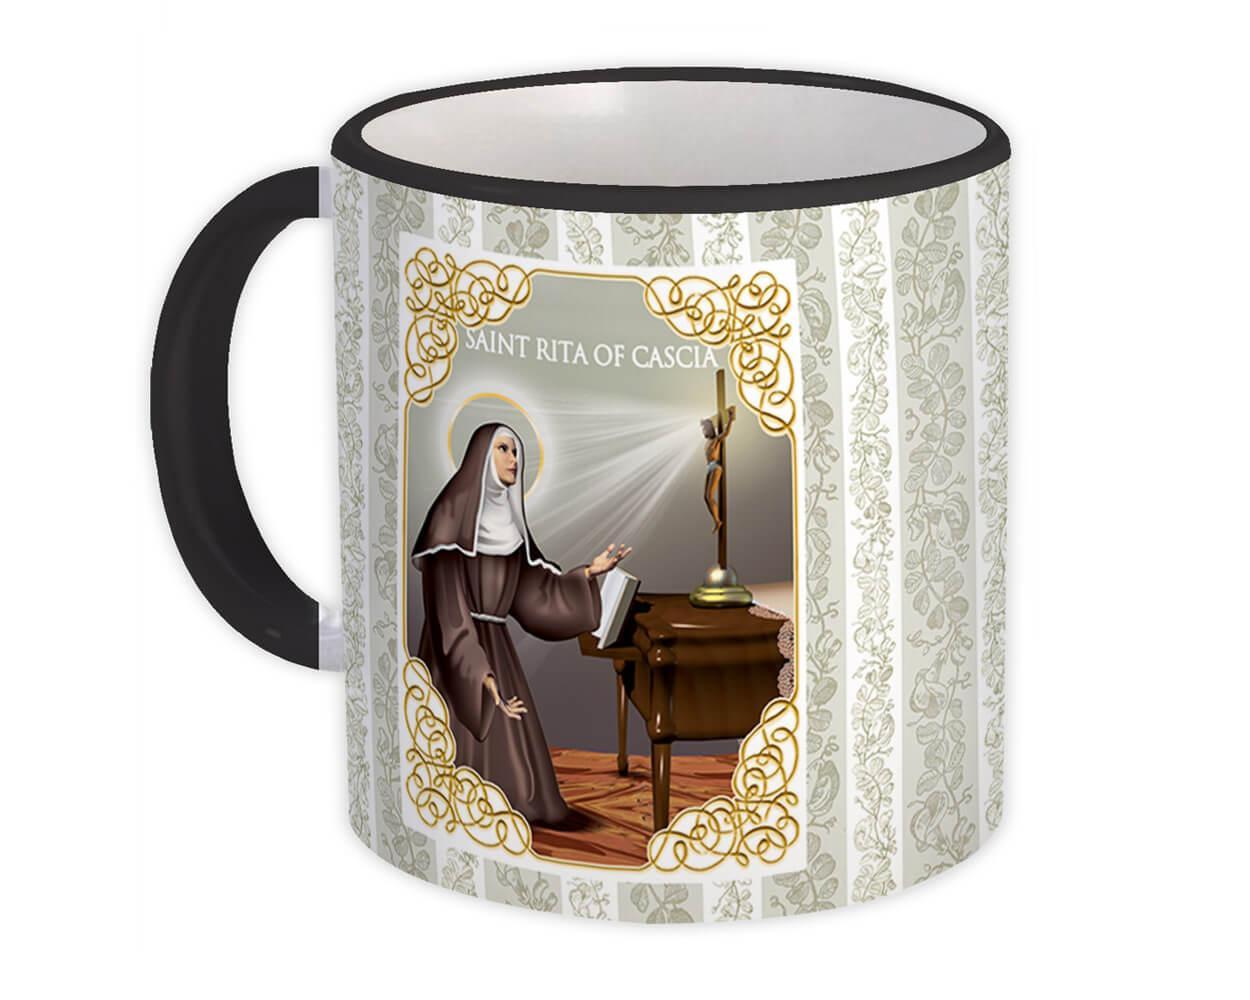 Saint Rita of Cascia : Gift Mug Catholic Religious Virgin